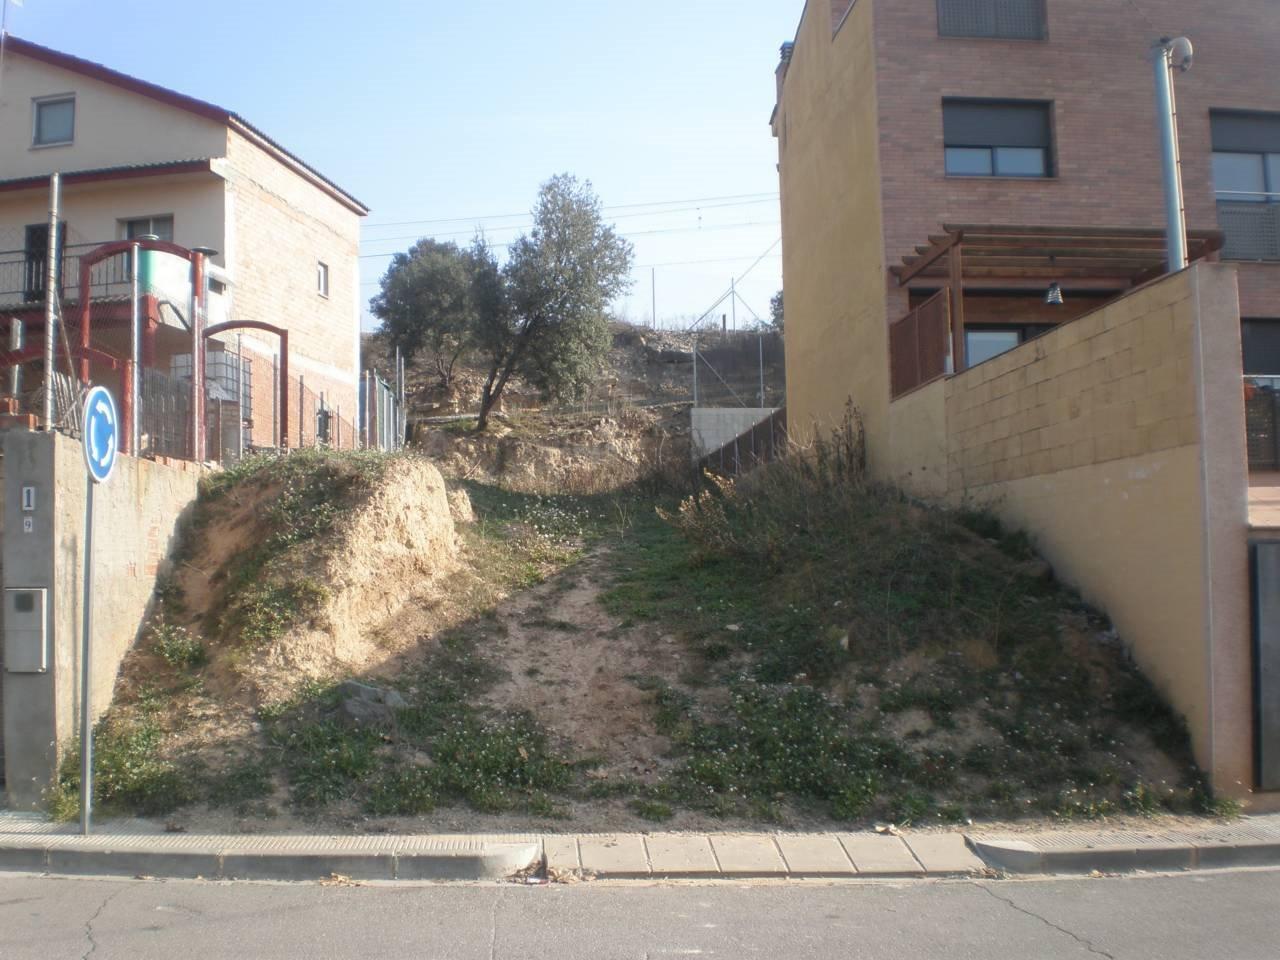 Terreno en URB. TORRE DEL BRENY (Castellgalí)